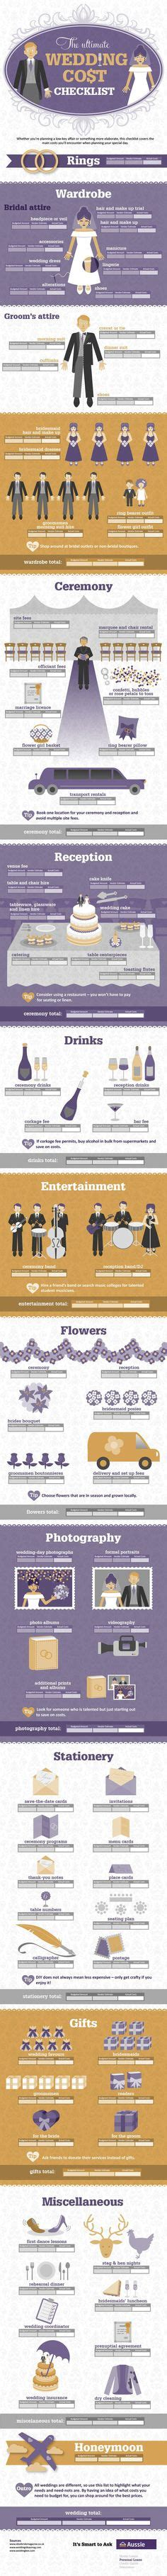 Wedding Checklist From Jean M by Printable Wedding Planning Checklist For Diy Brides